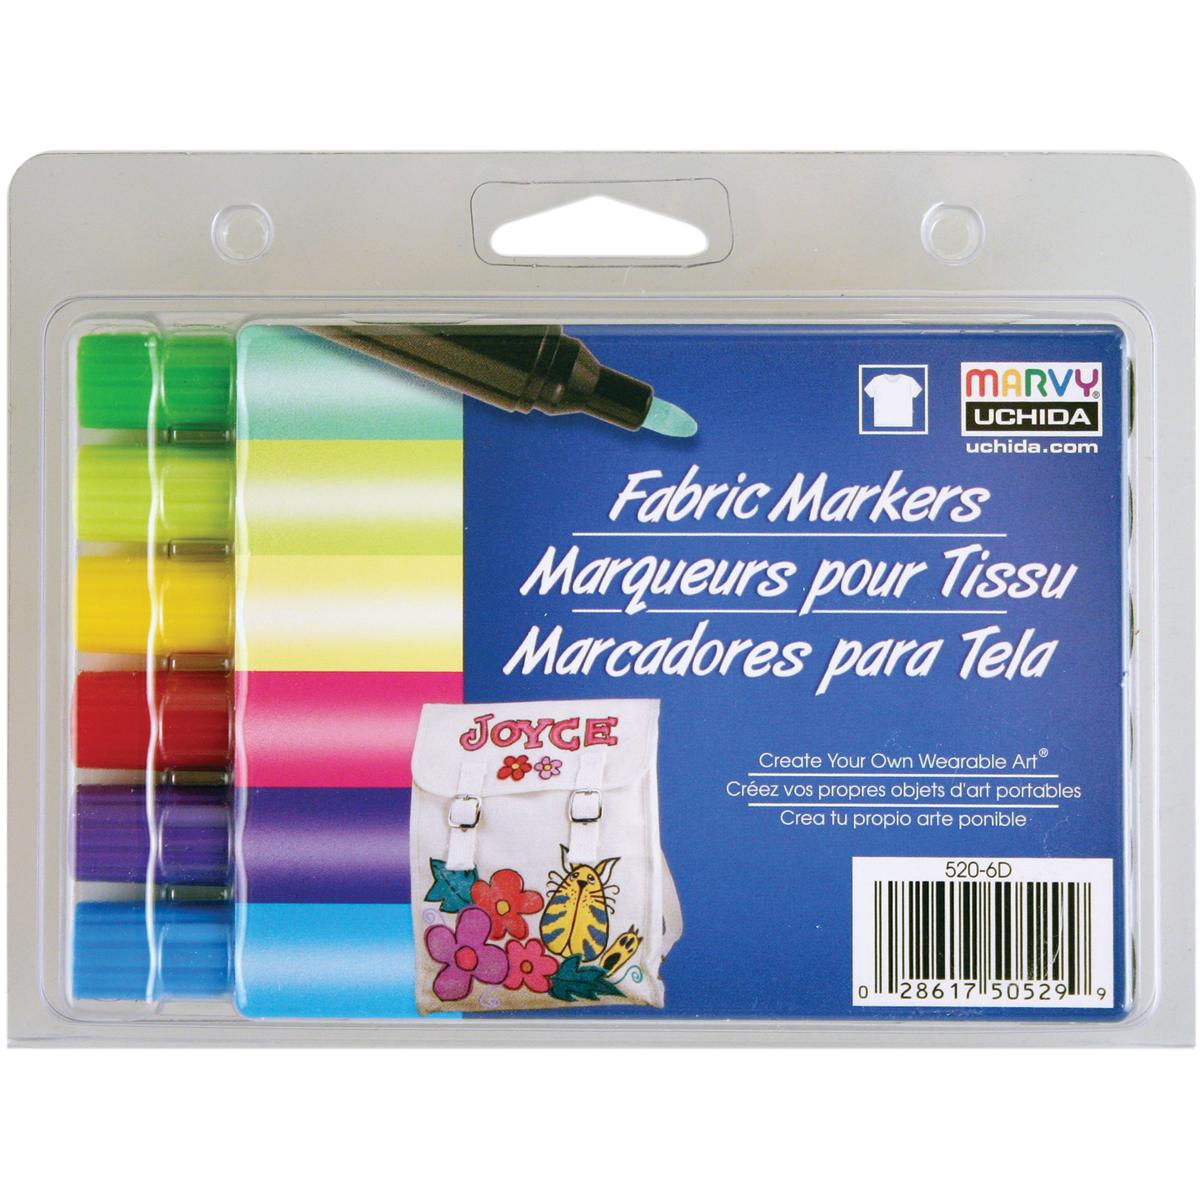 Fabric Marker Broad Tip, 6/pk, Brilliant